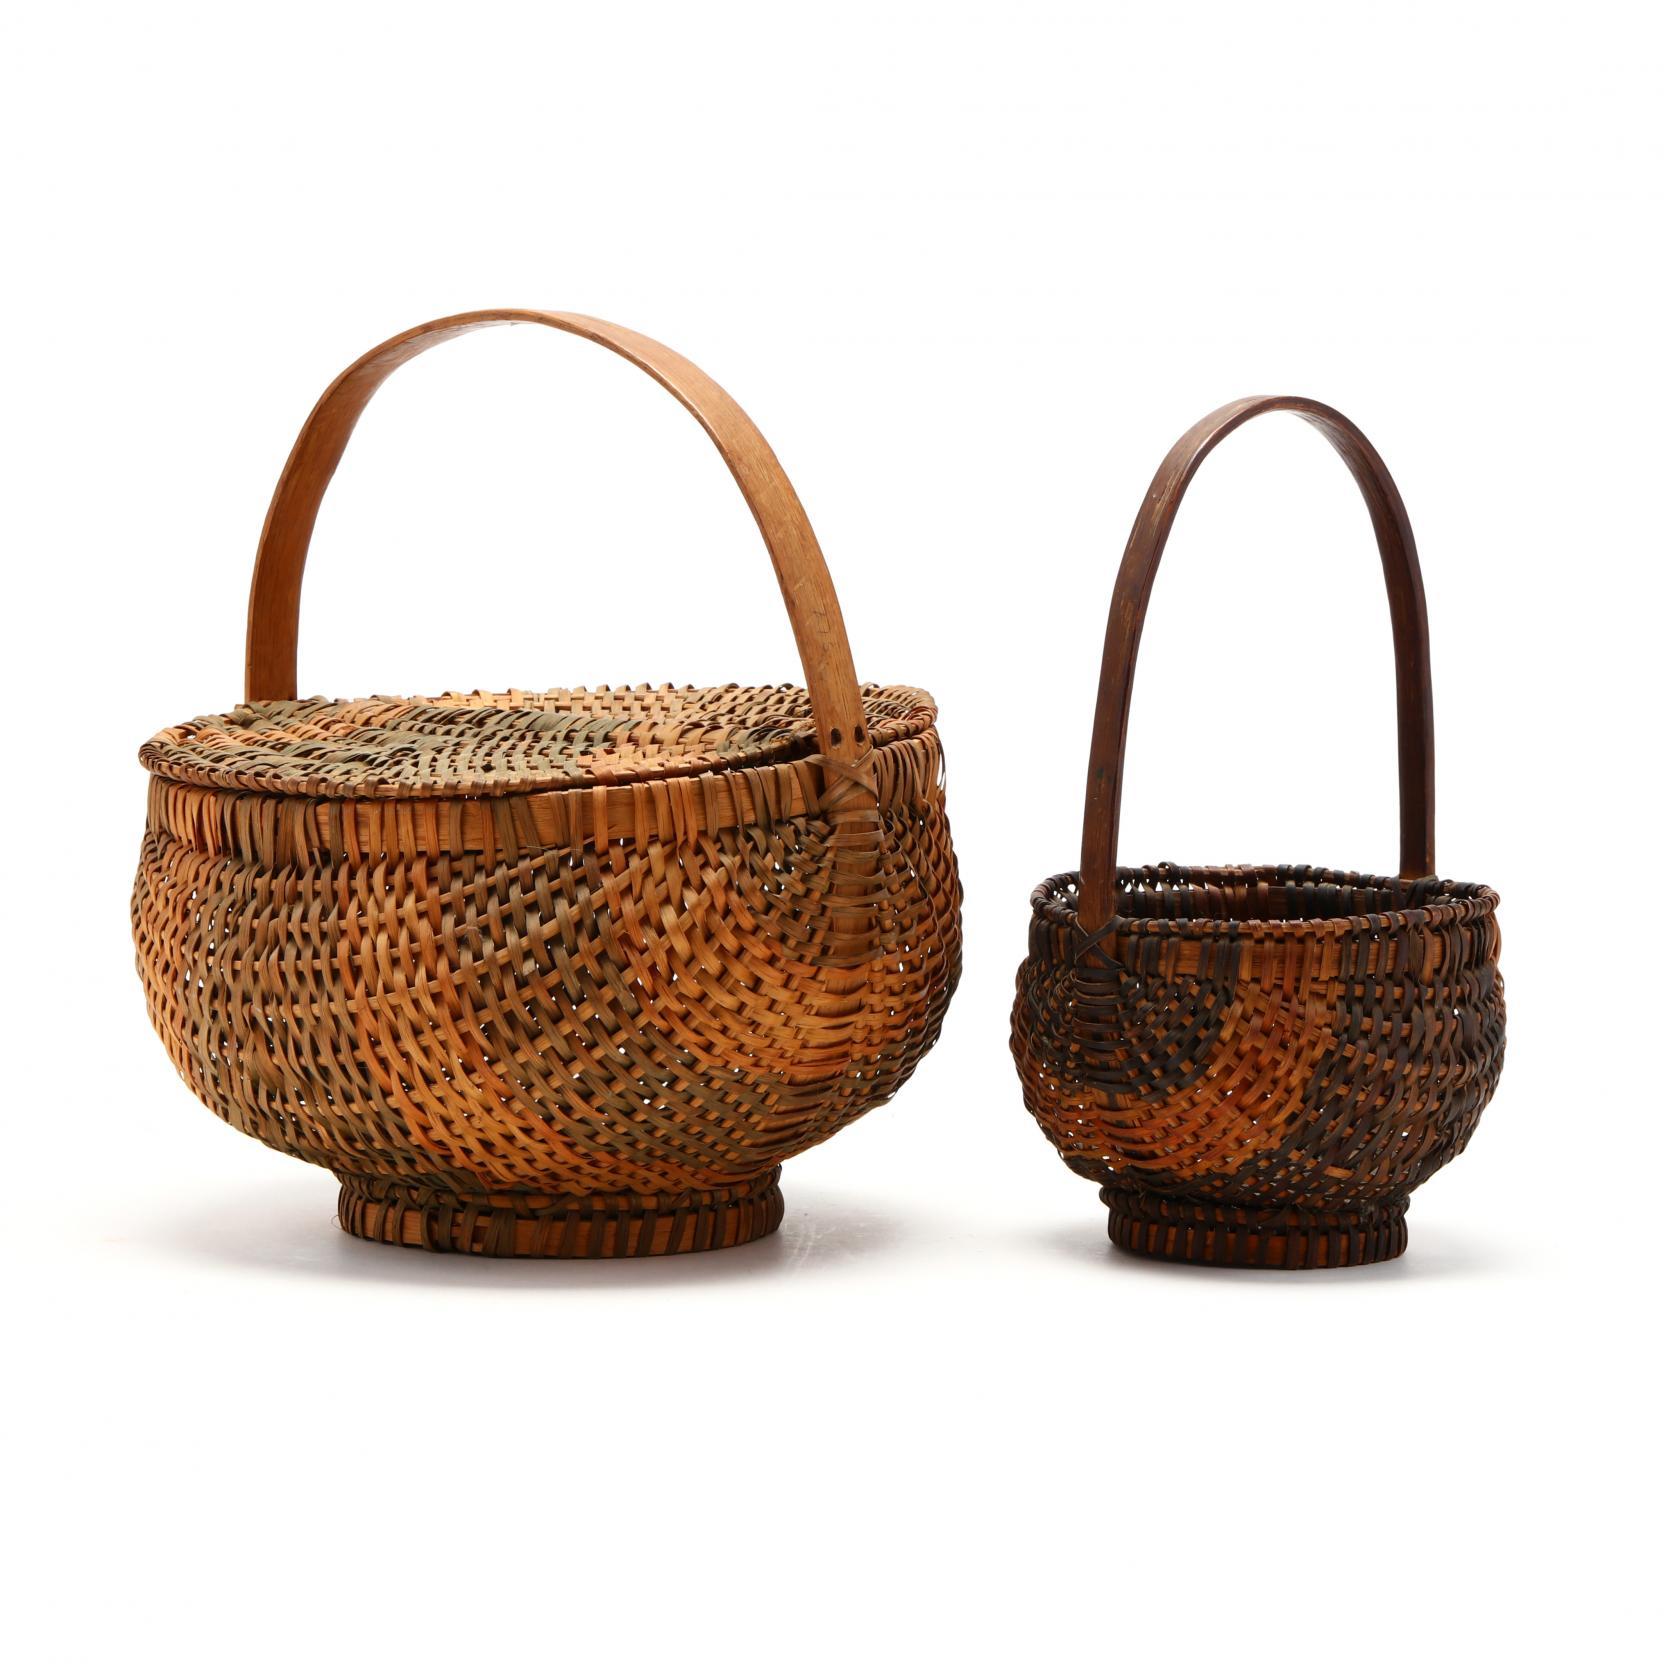 two-vintage-cherokee-white-oak-baskets